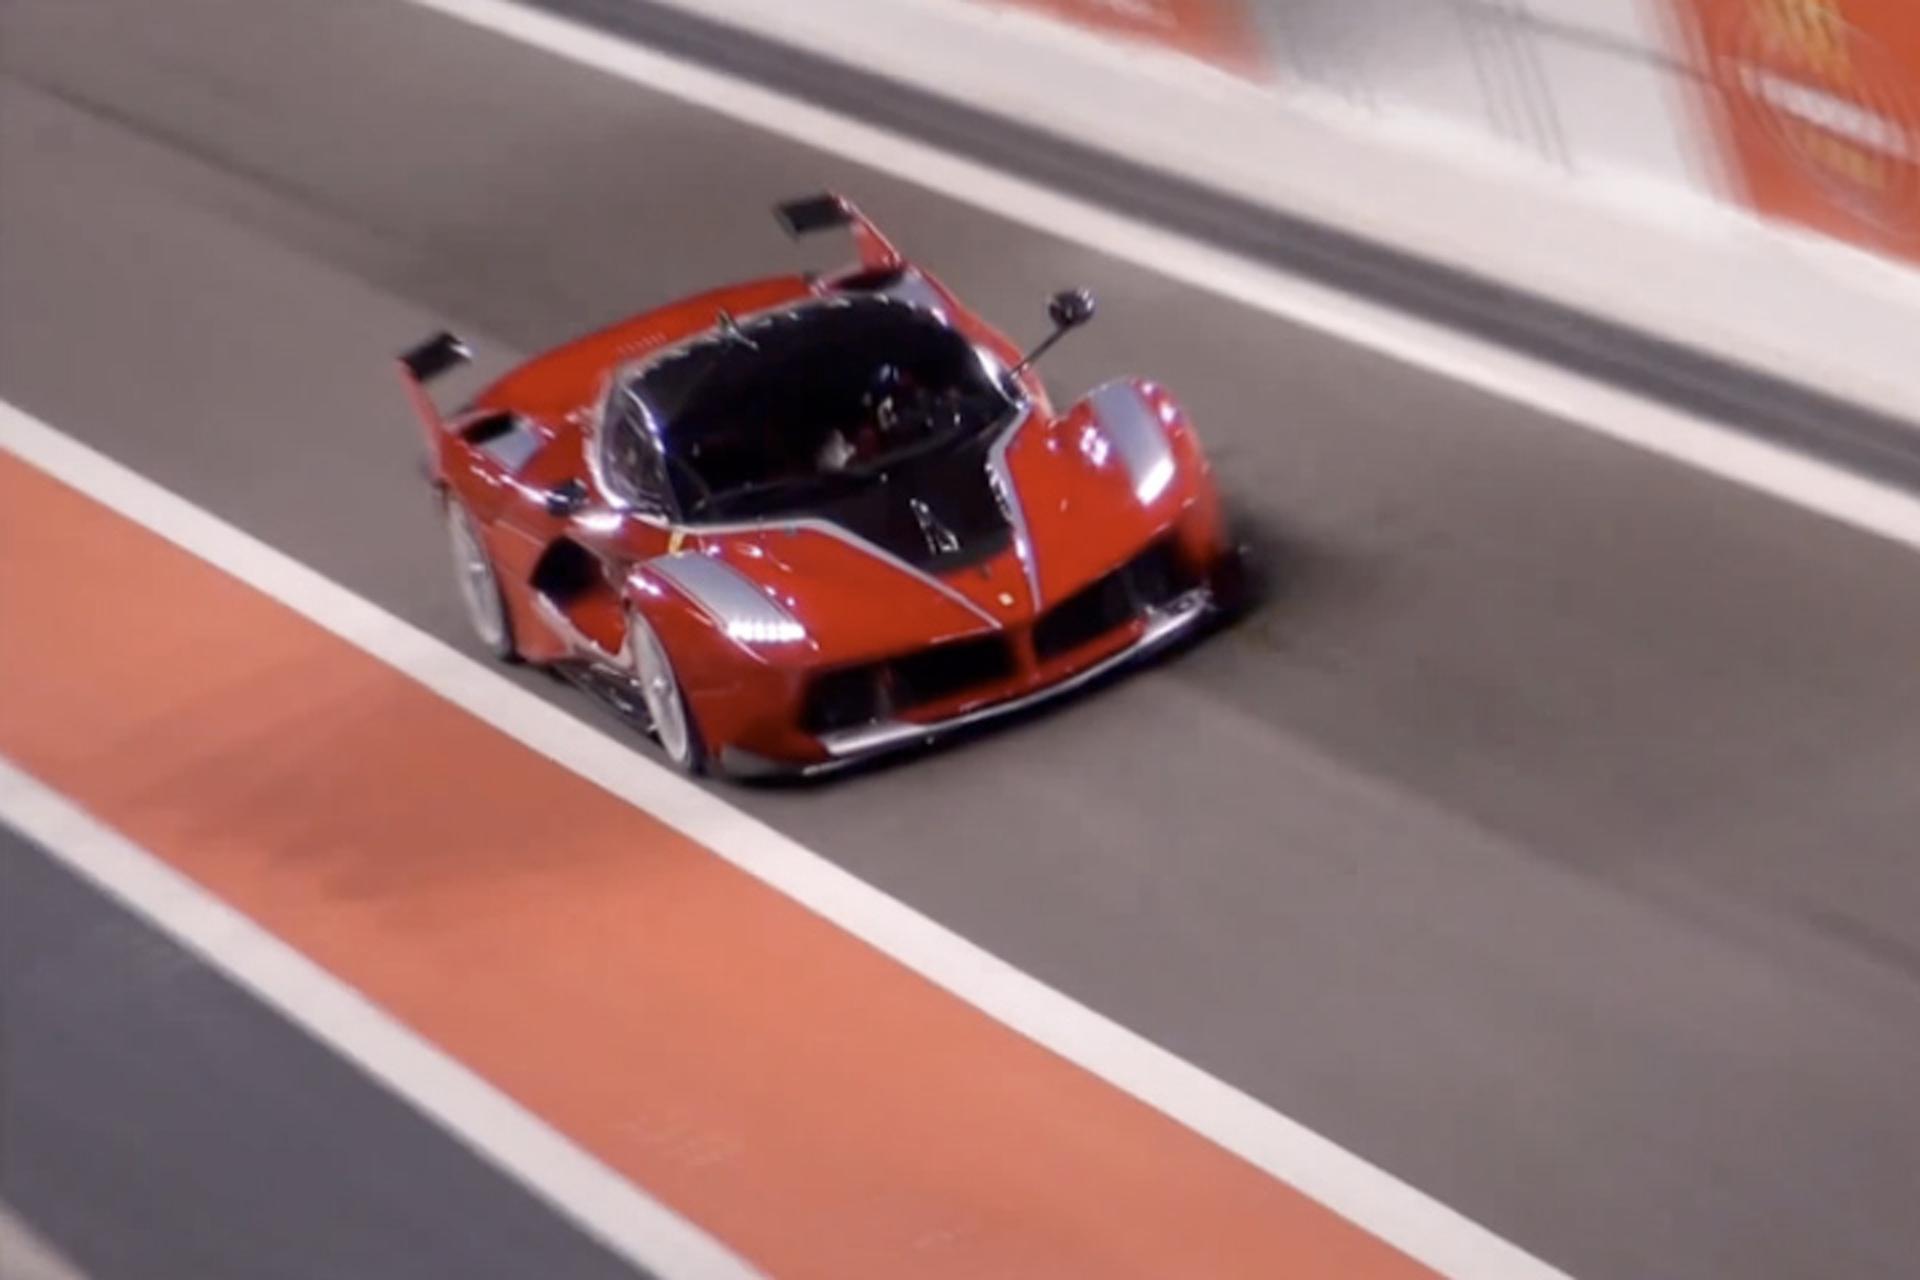 Watch the 1035HP Ferrari FXX K Scream on Track